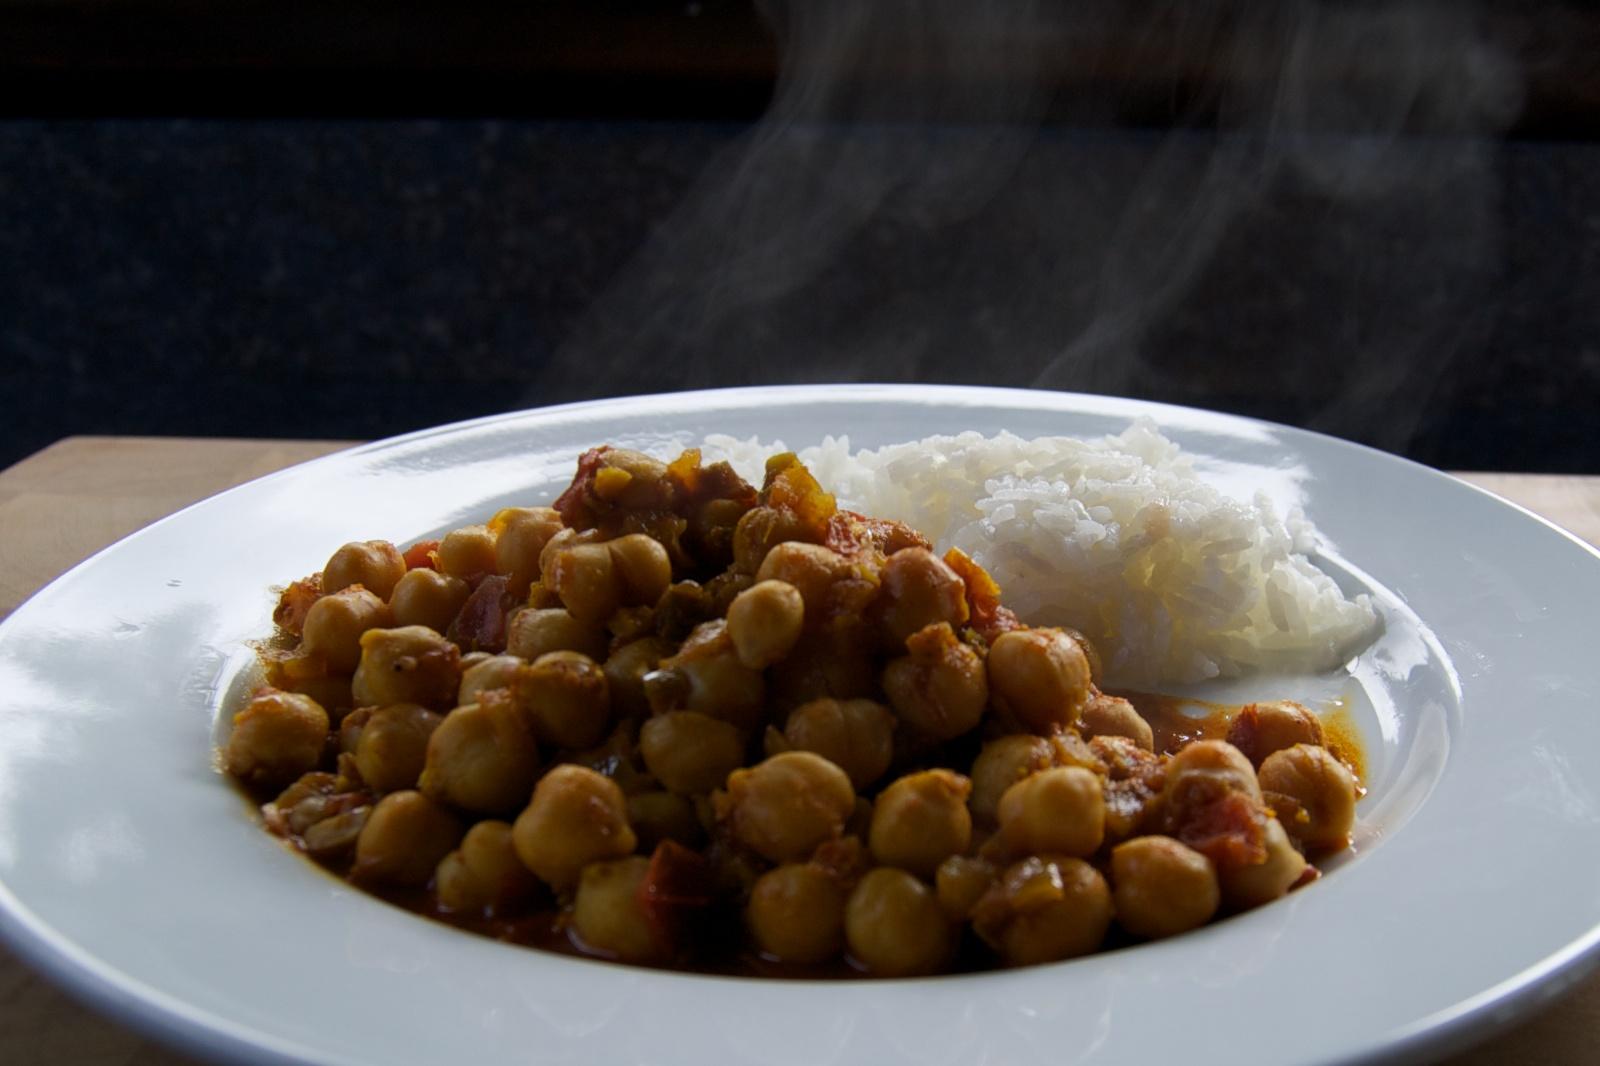 http://blog.rickk.com/food/2012/08/20/ate.2012.08.20.l.jpg